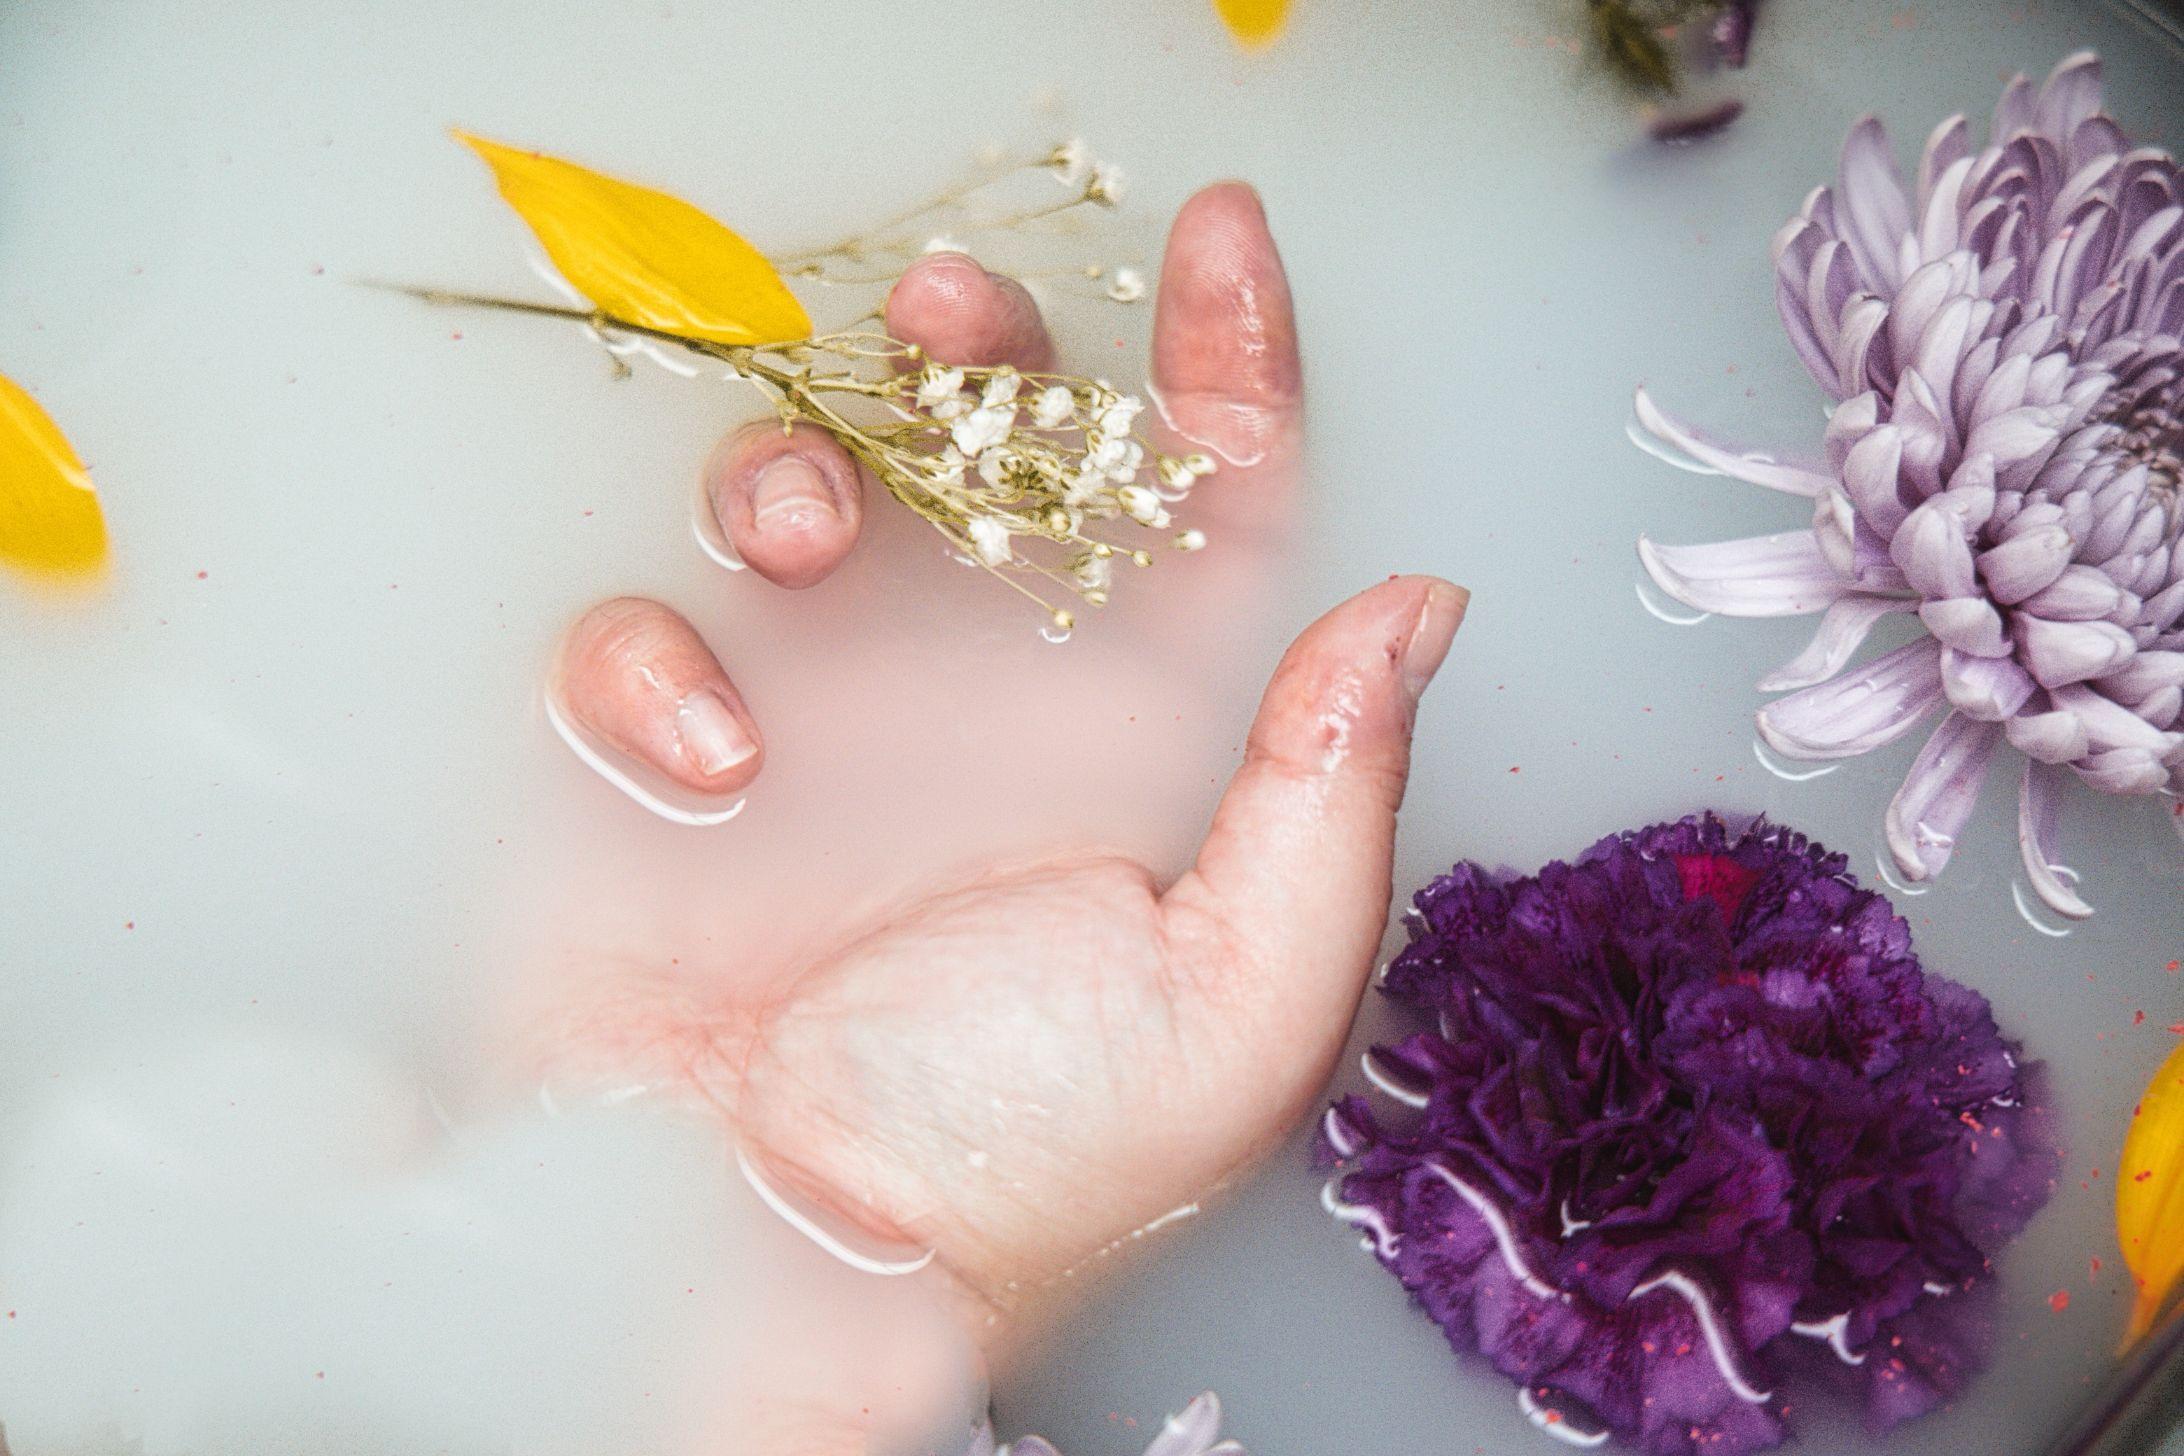 5 Tahapan Mempercantik Kuku dengan Manicure di Spa Terbaik